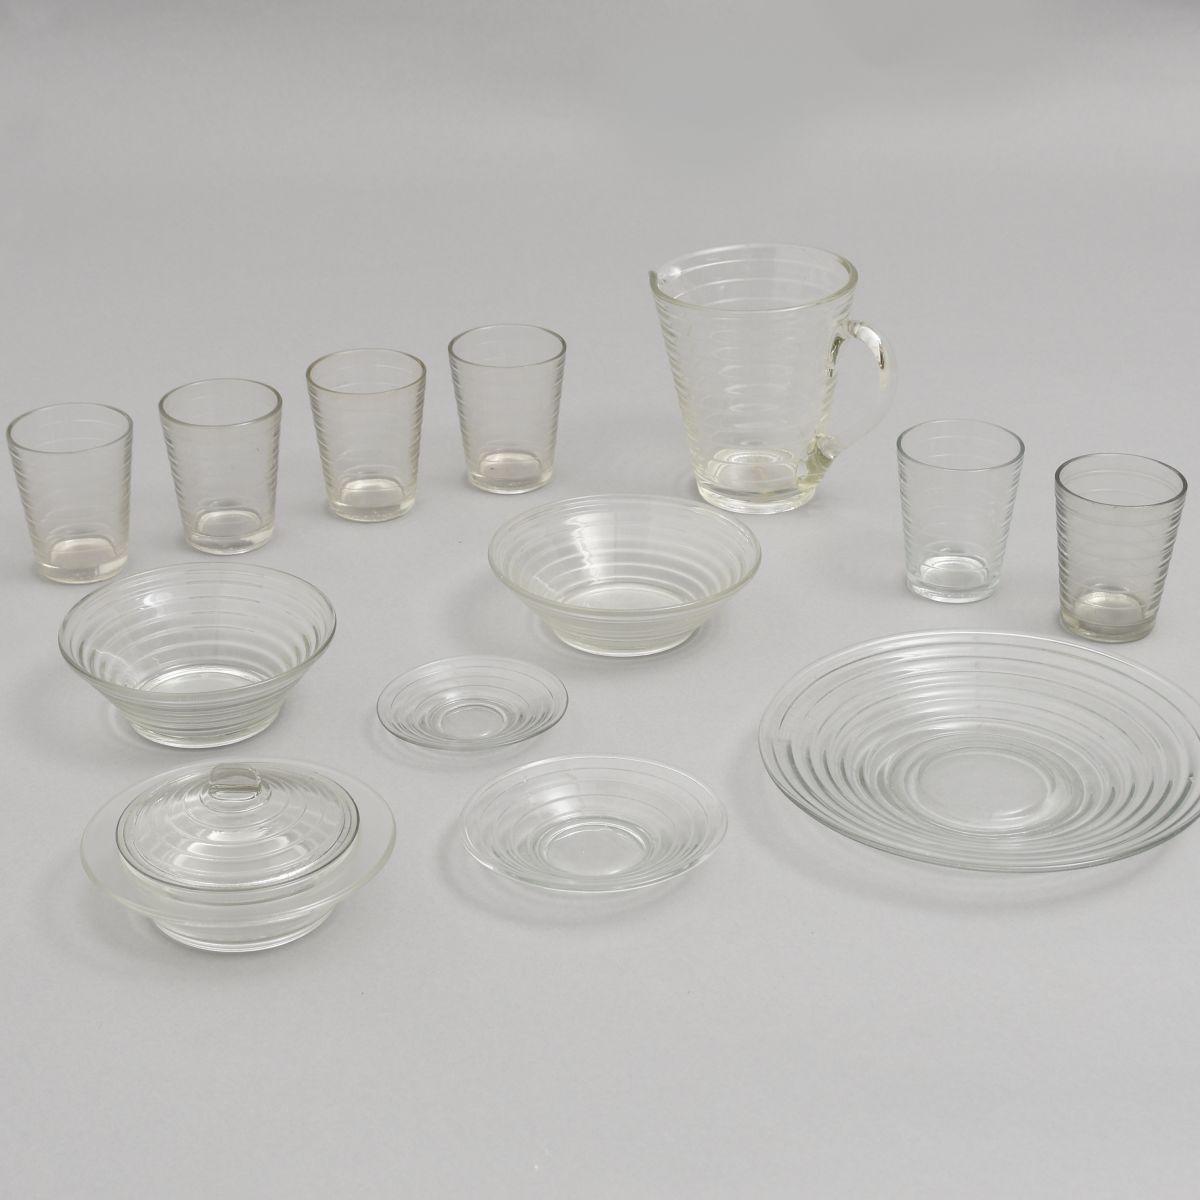 Aalto-Aino-Bölgeblick-Clear-Items